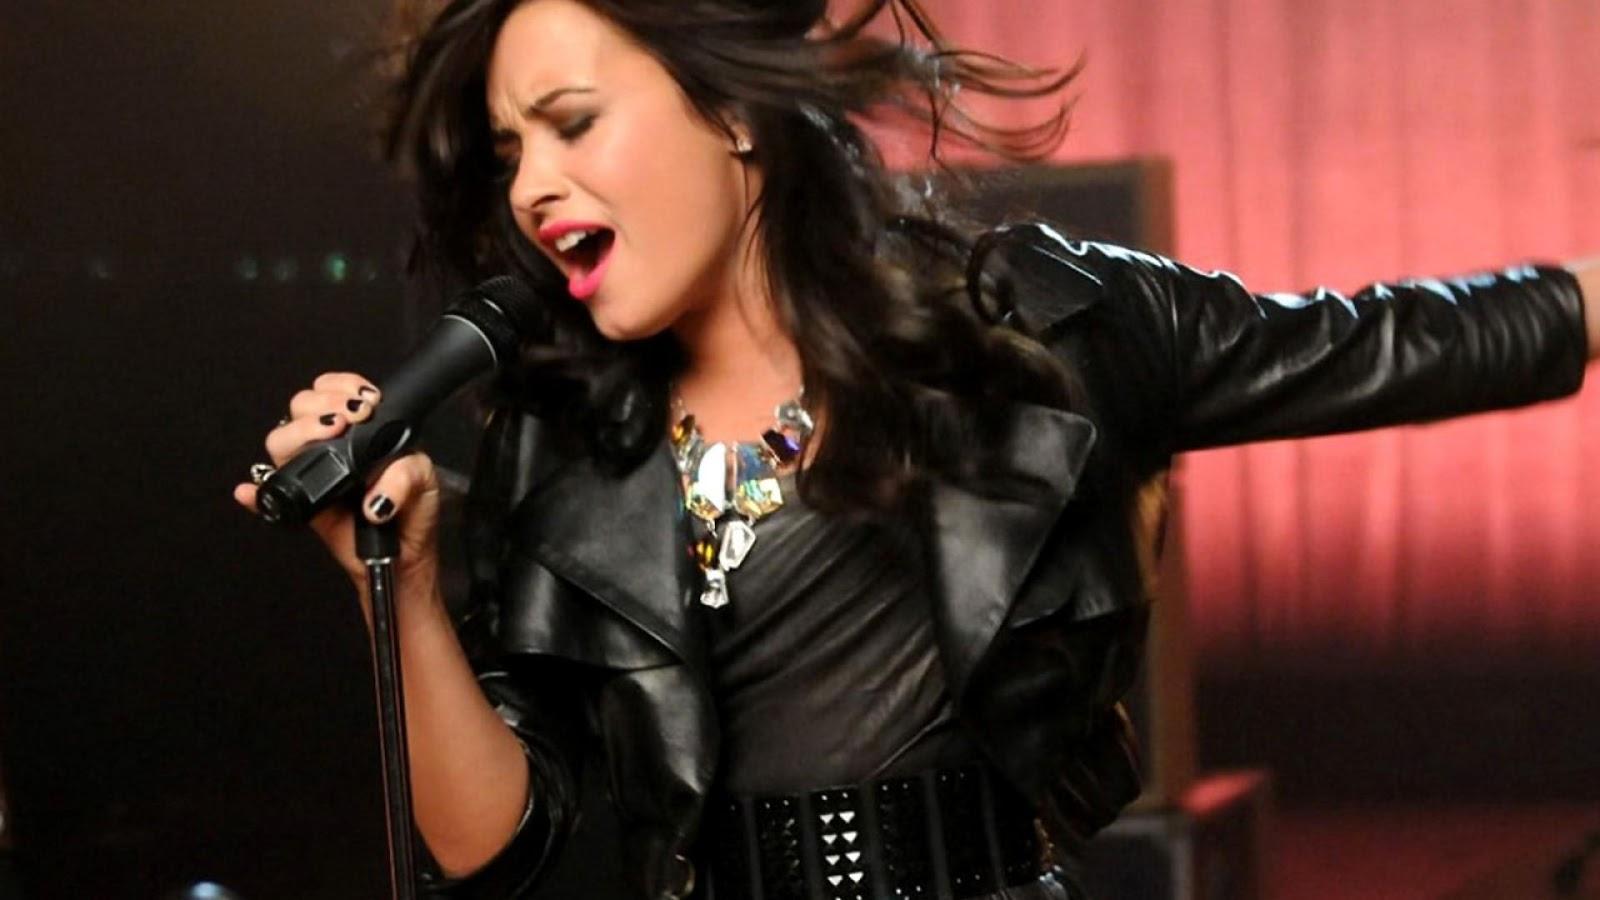 http://3.bp.blogspot.com/-tiDel9g1kFw/URRFQiUFHeI/AAAAAAAADrg/CjGiHQF1V94/s1600/Demi-Lovato-2013-Singer-HD-Wallpaper.jpg